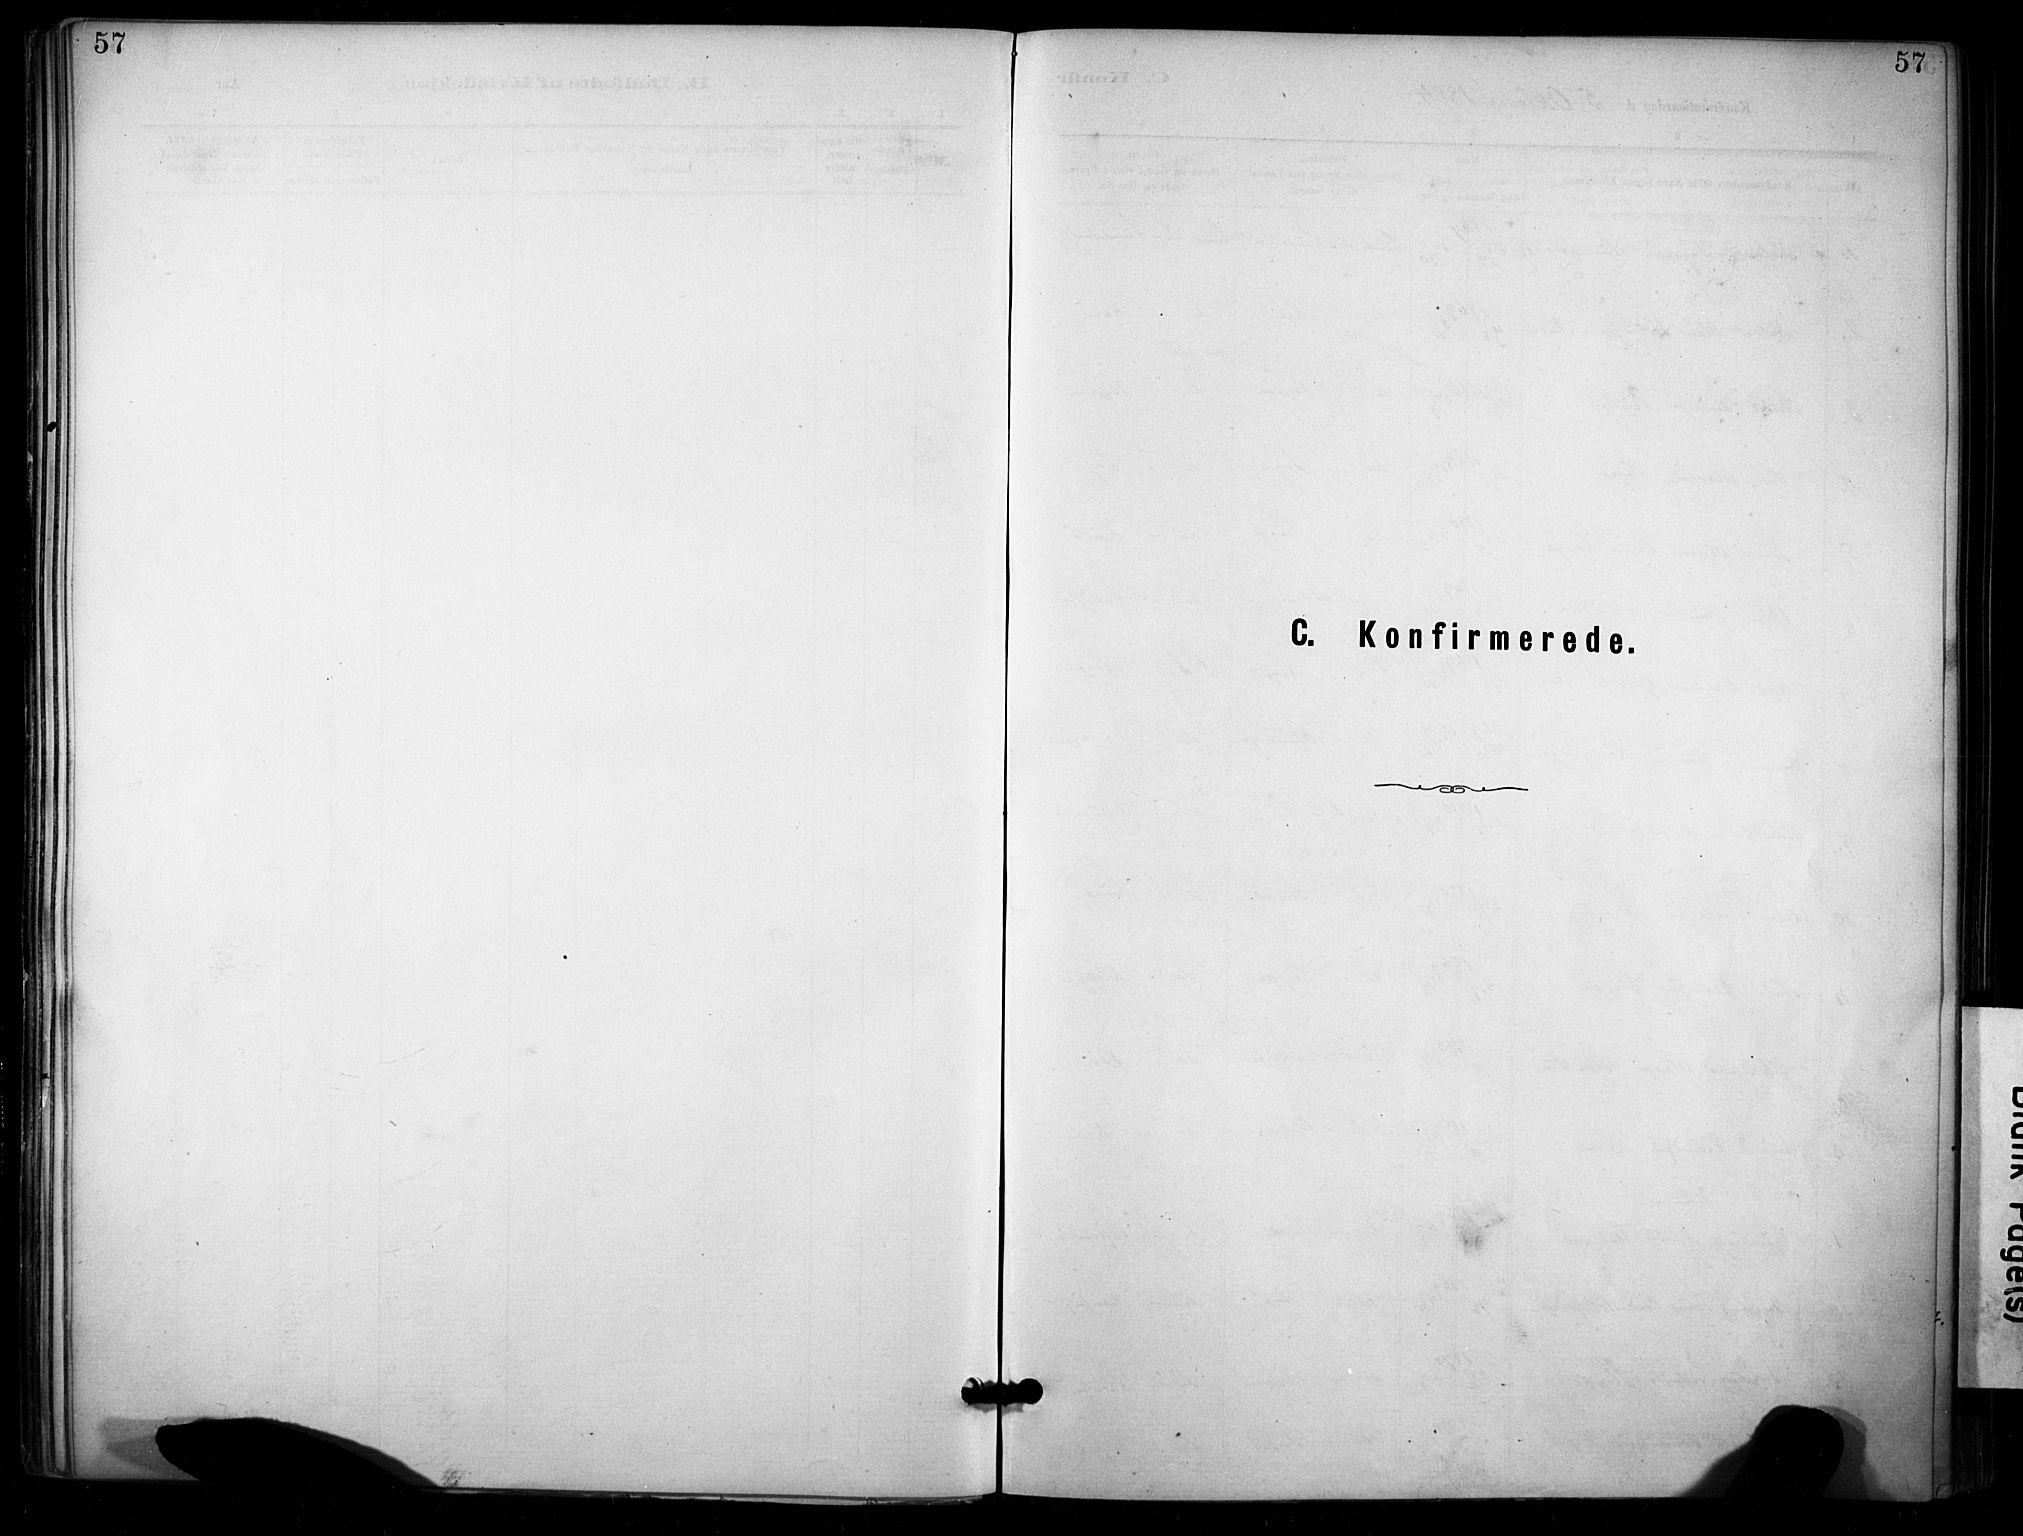 SAKO, Lunde kirkebøker, F/Fa/L0002: Ministerialbok nr. I 2, 1884-1892, s. 57